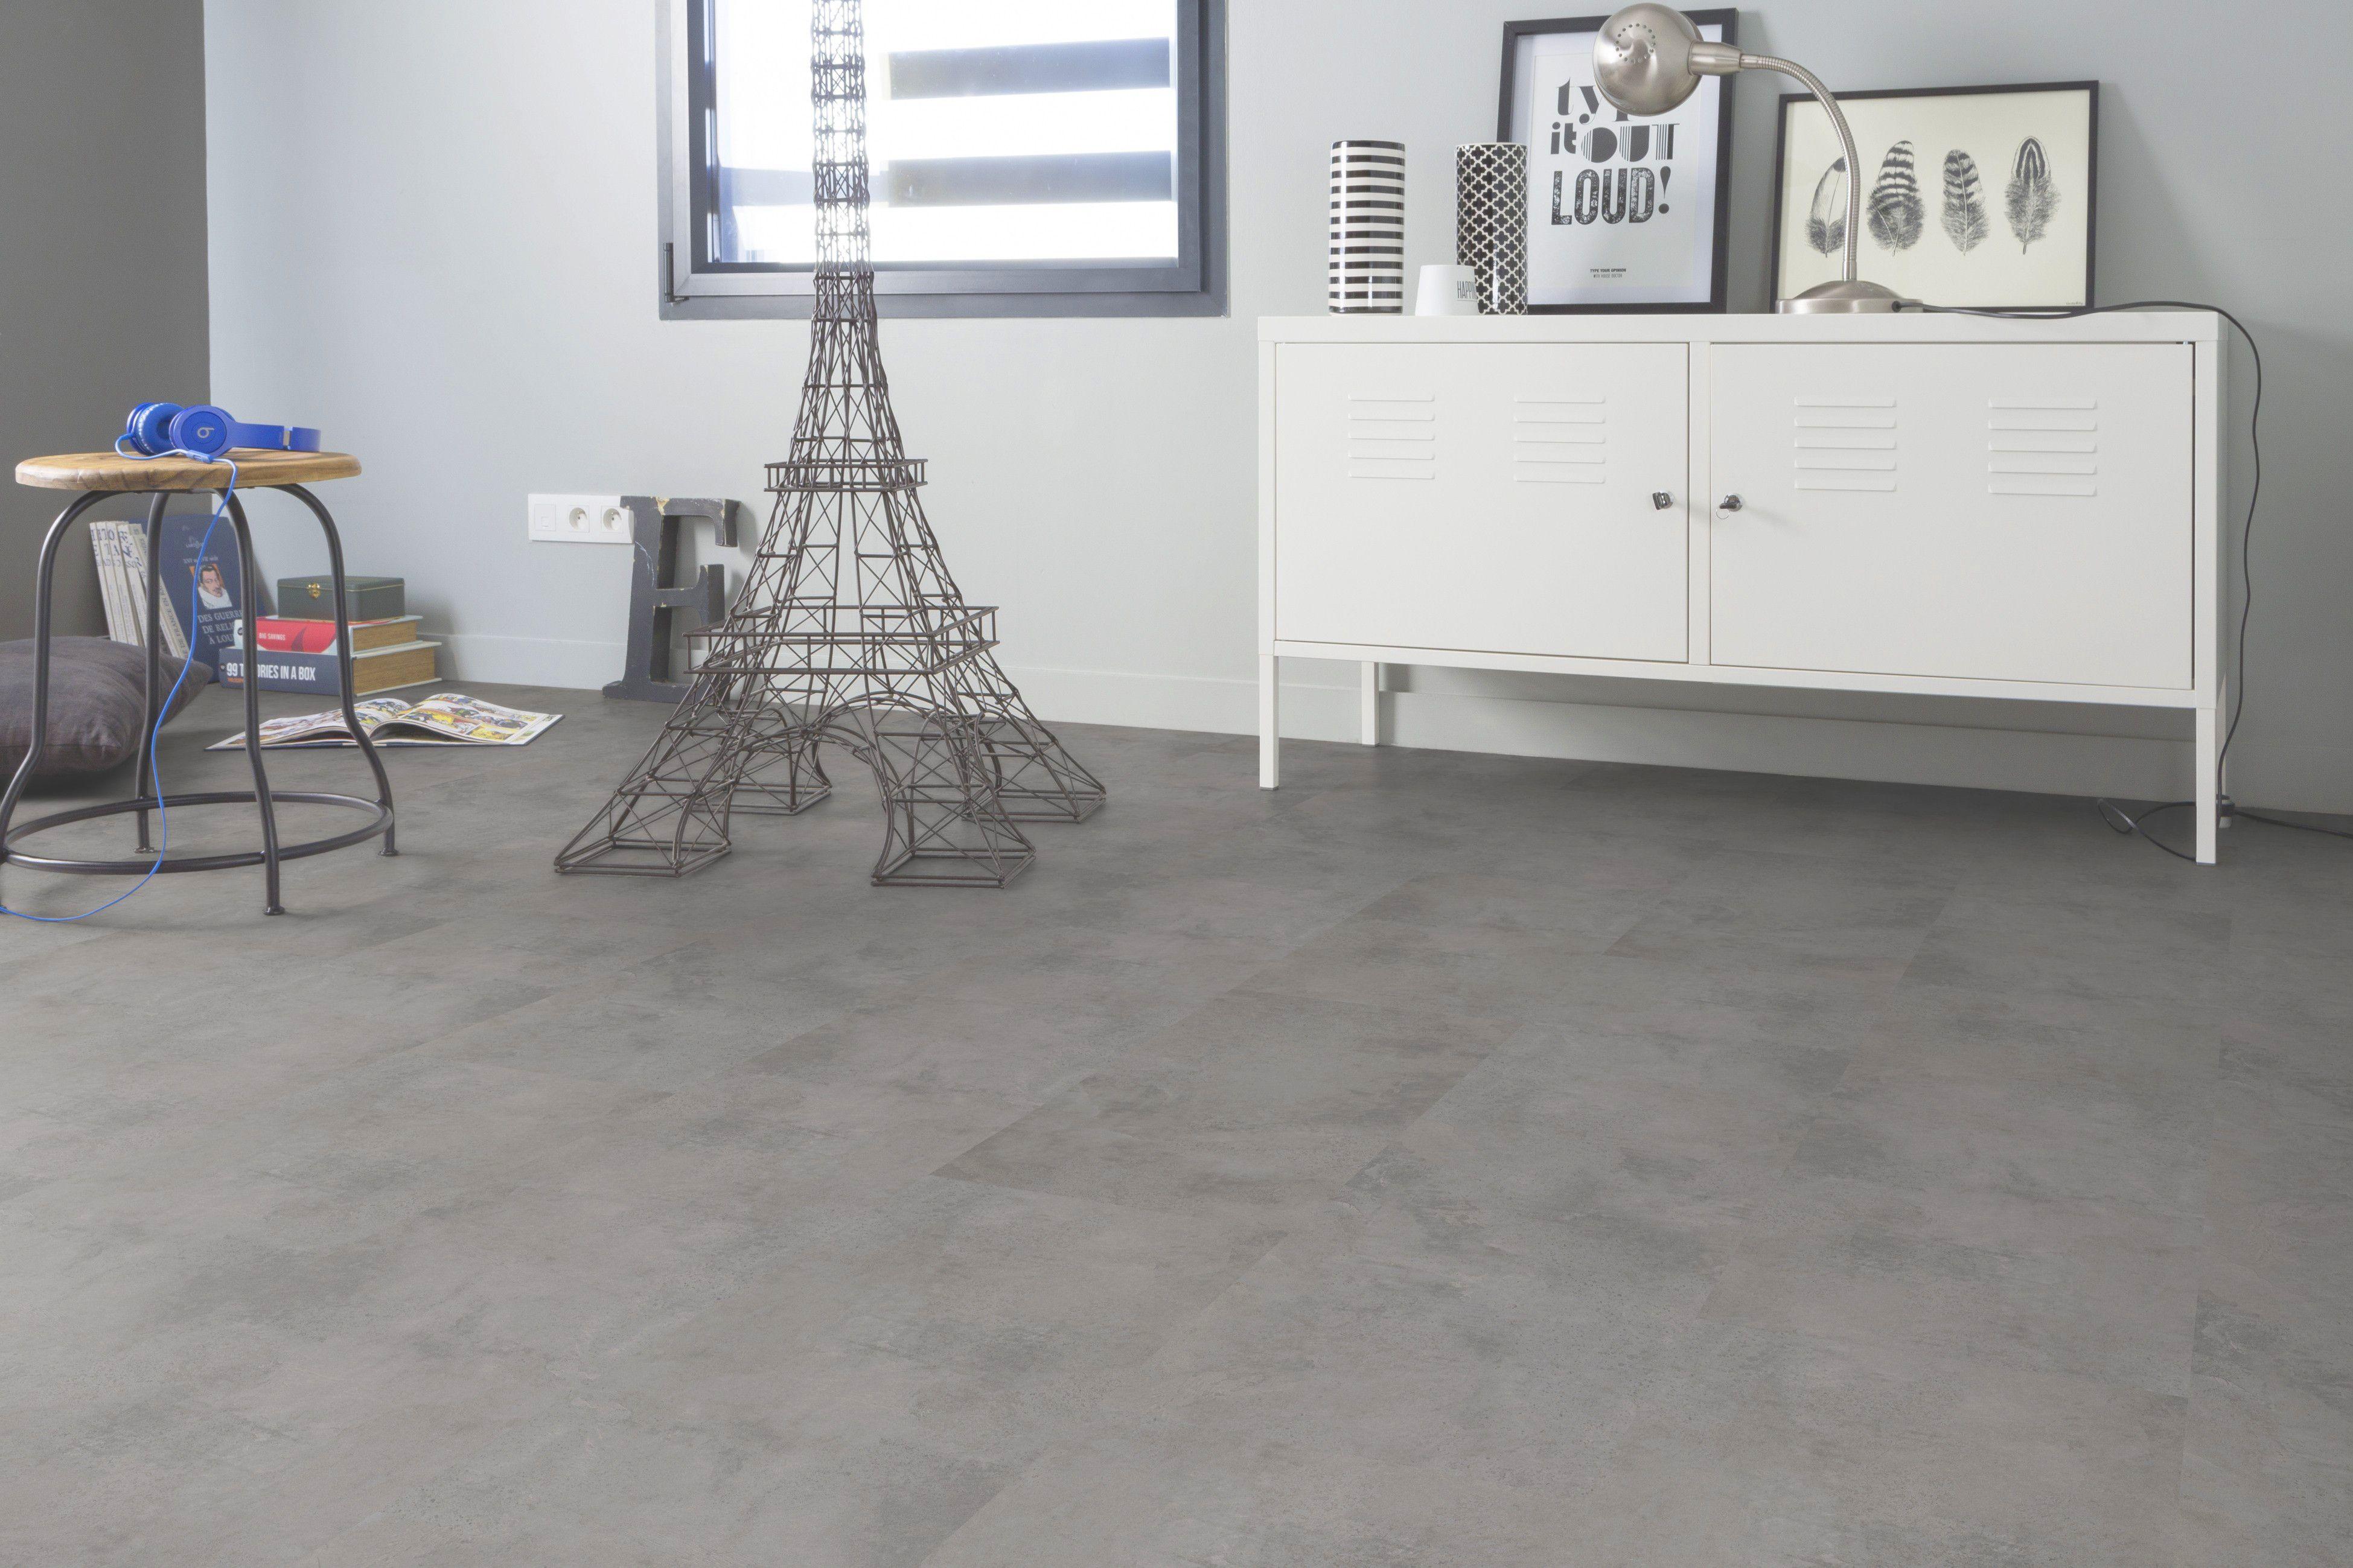 Pvc ber fliesen gallery of latest full size of vinylboden